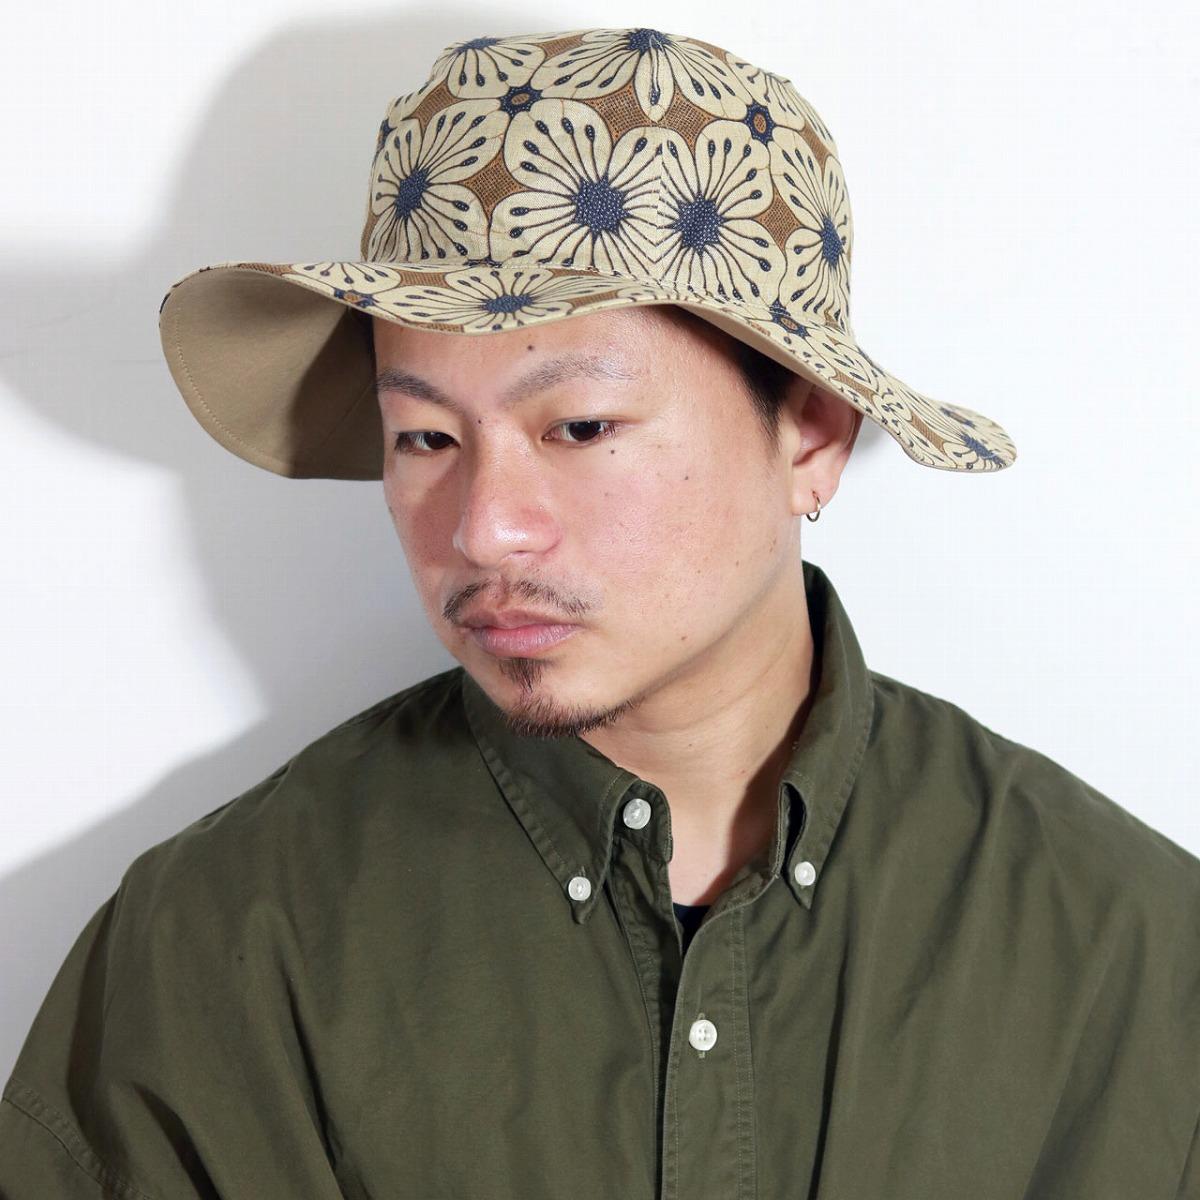 Racal Hat mens sahari Hat reversible floral Hat reversible solid handle  spring summer 30s 40s 50s ... 4770d5acb74